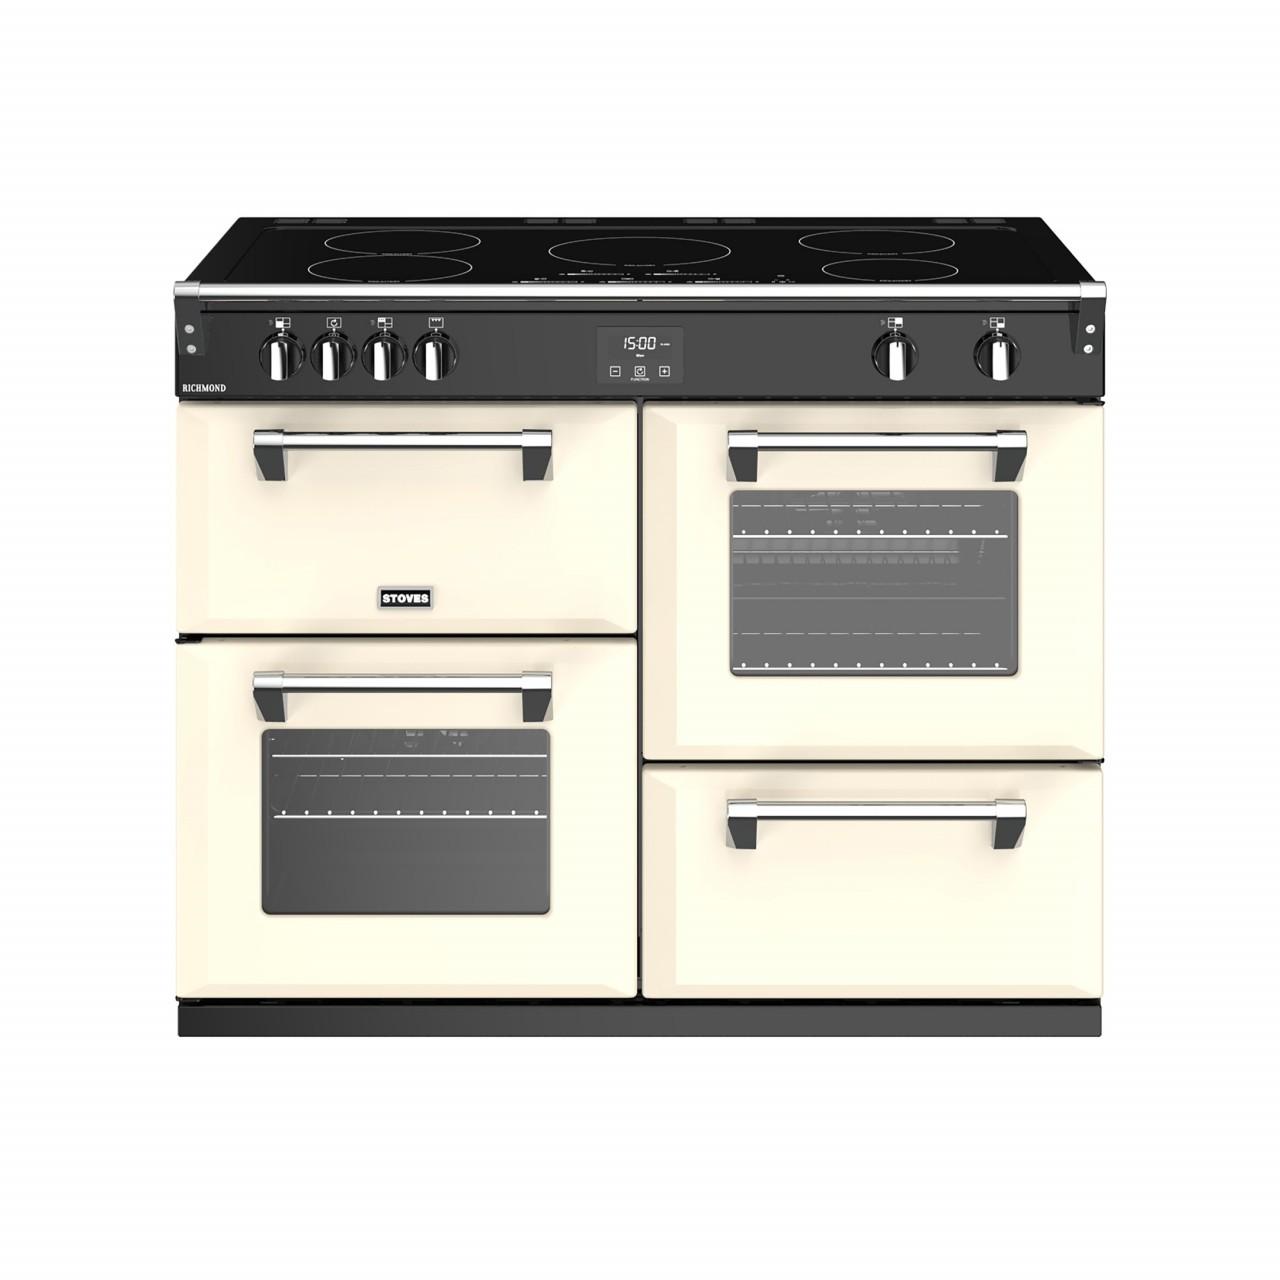 stoves richmond s1100ei classic cream electric range cooker rh stellisonselectrical co uk